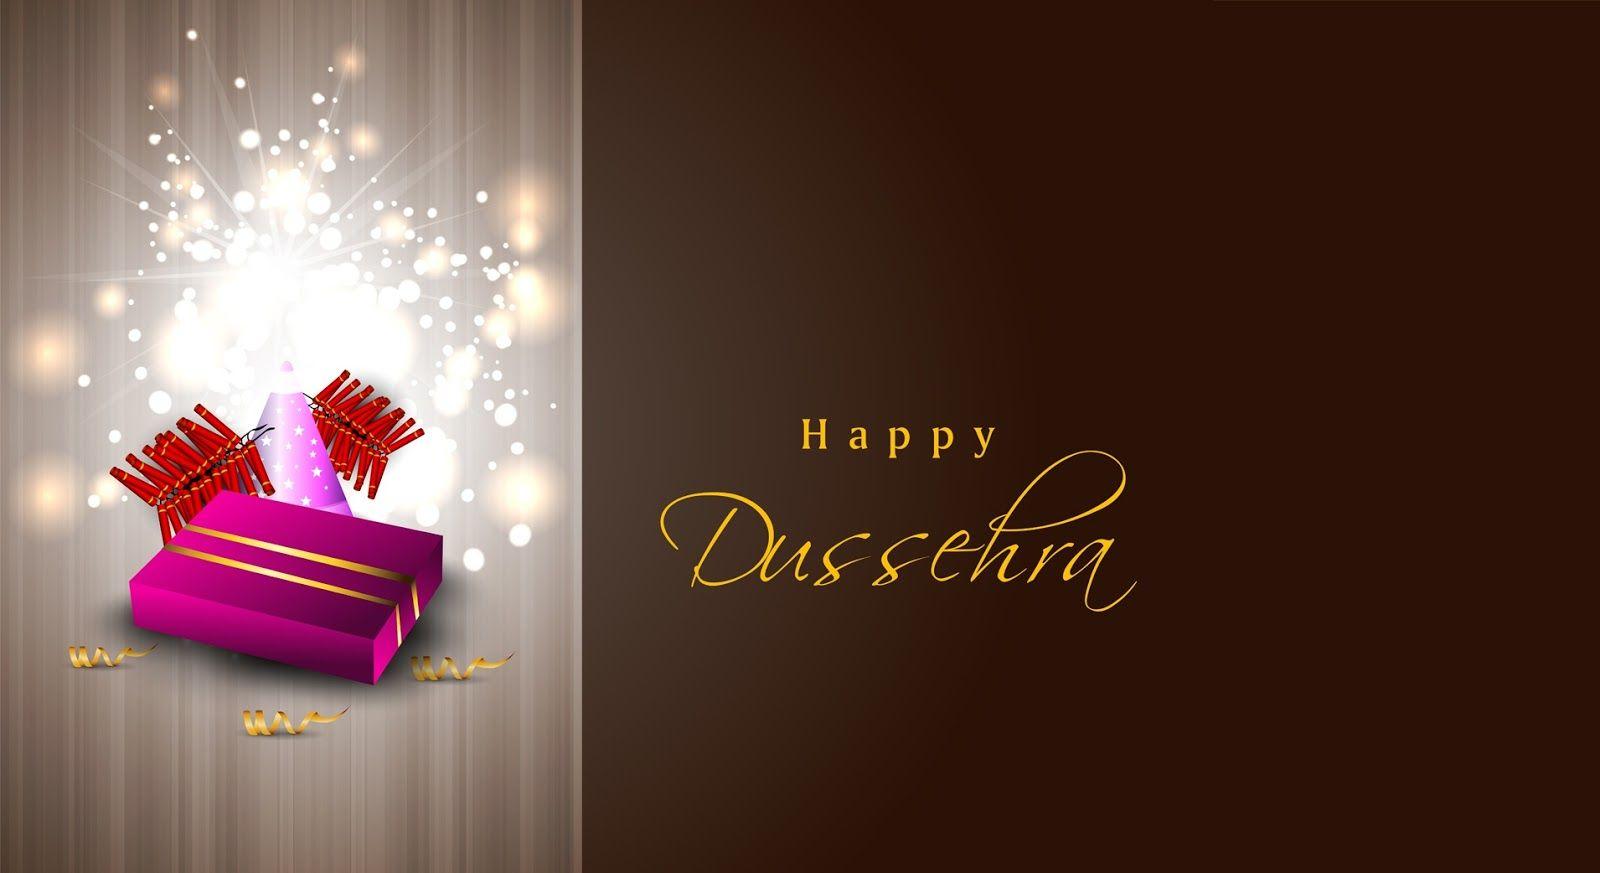 Best wishes Happy Dussehra